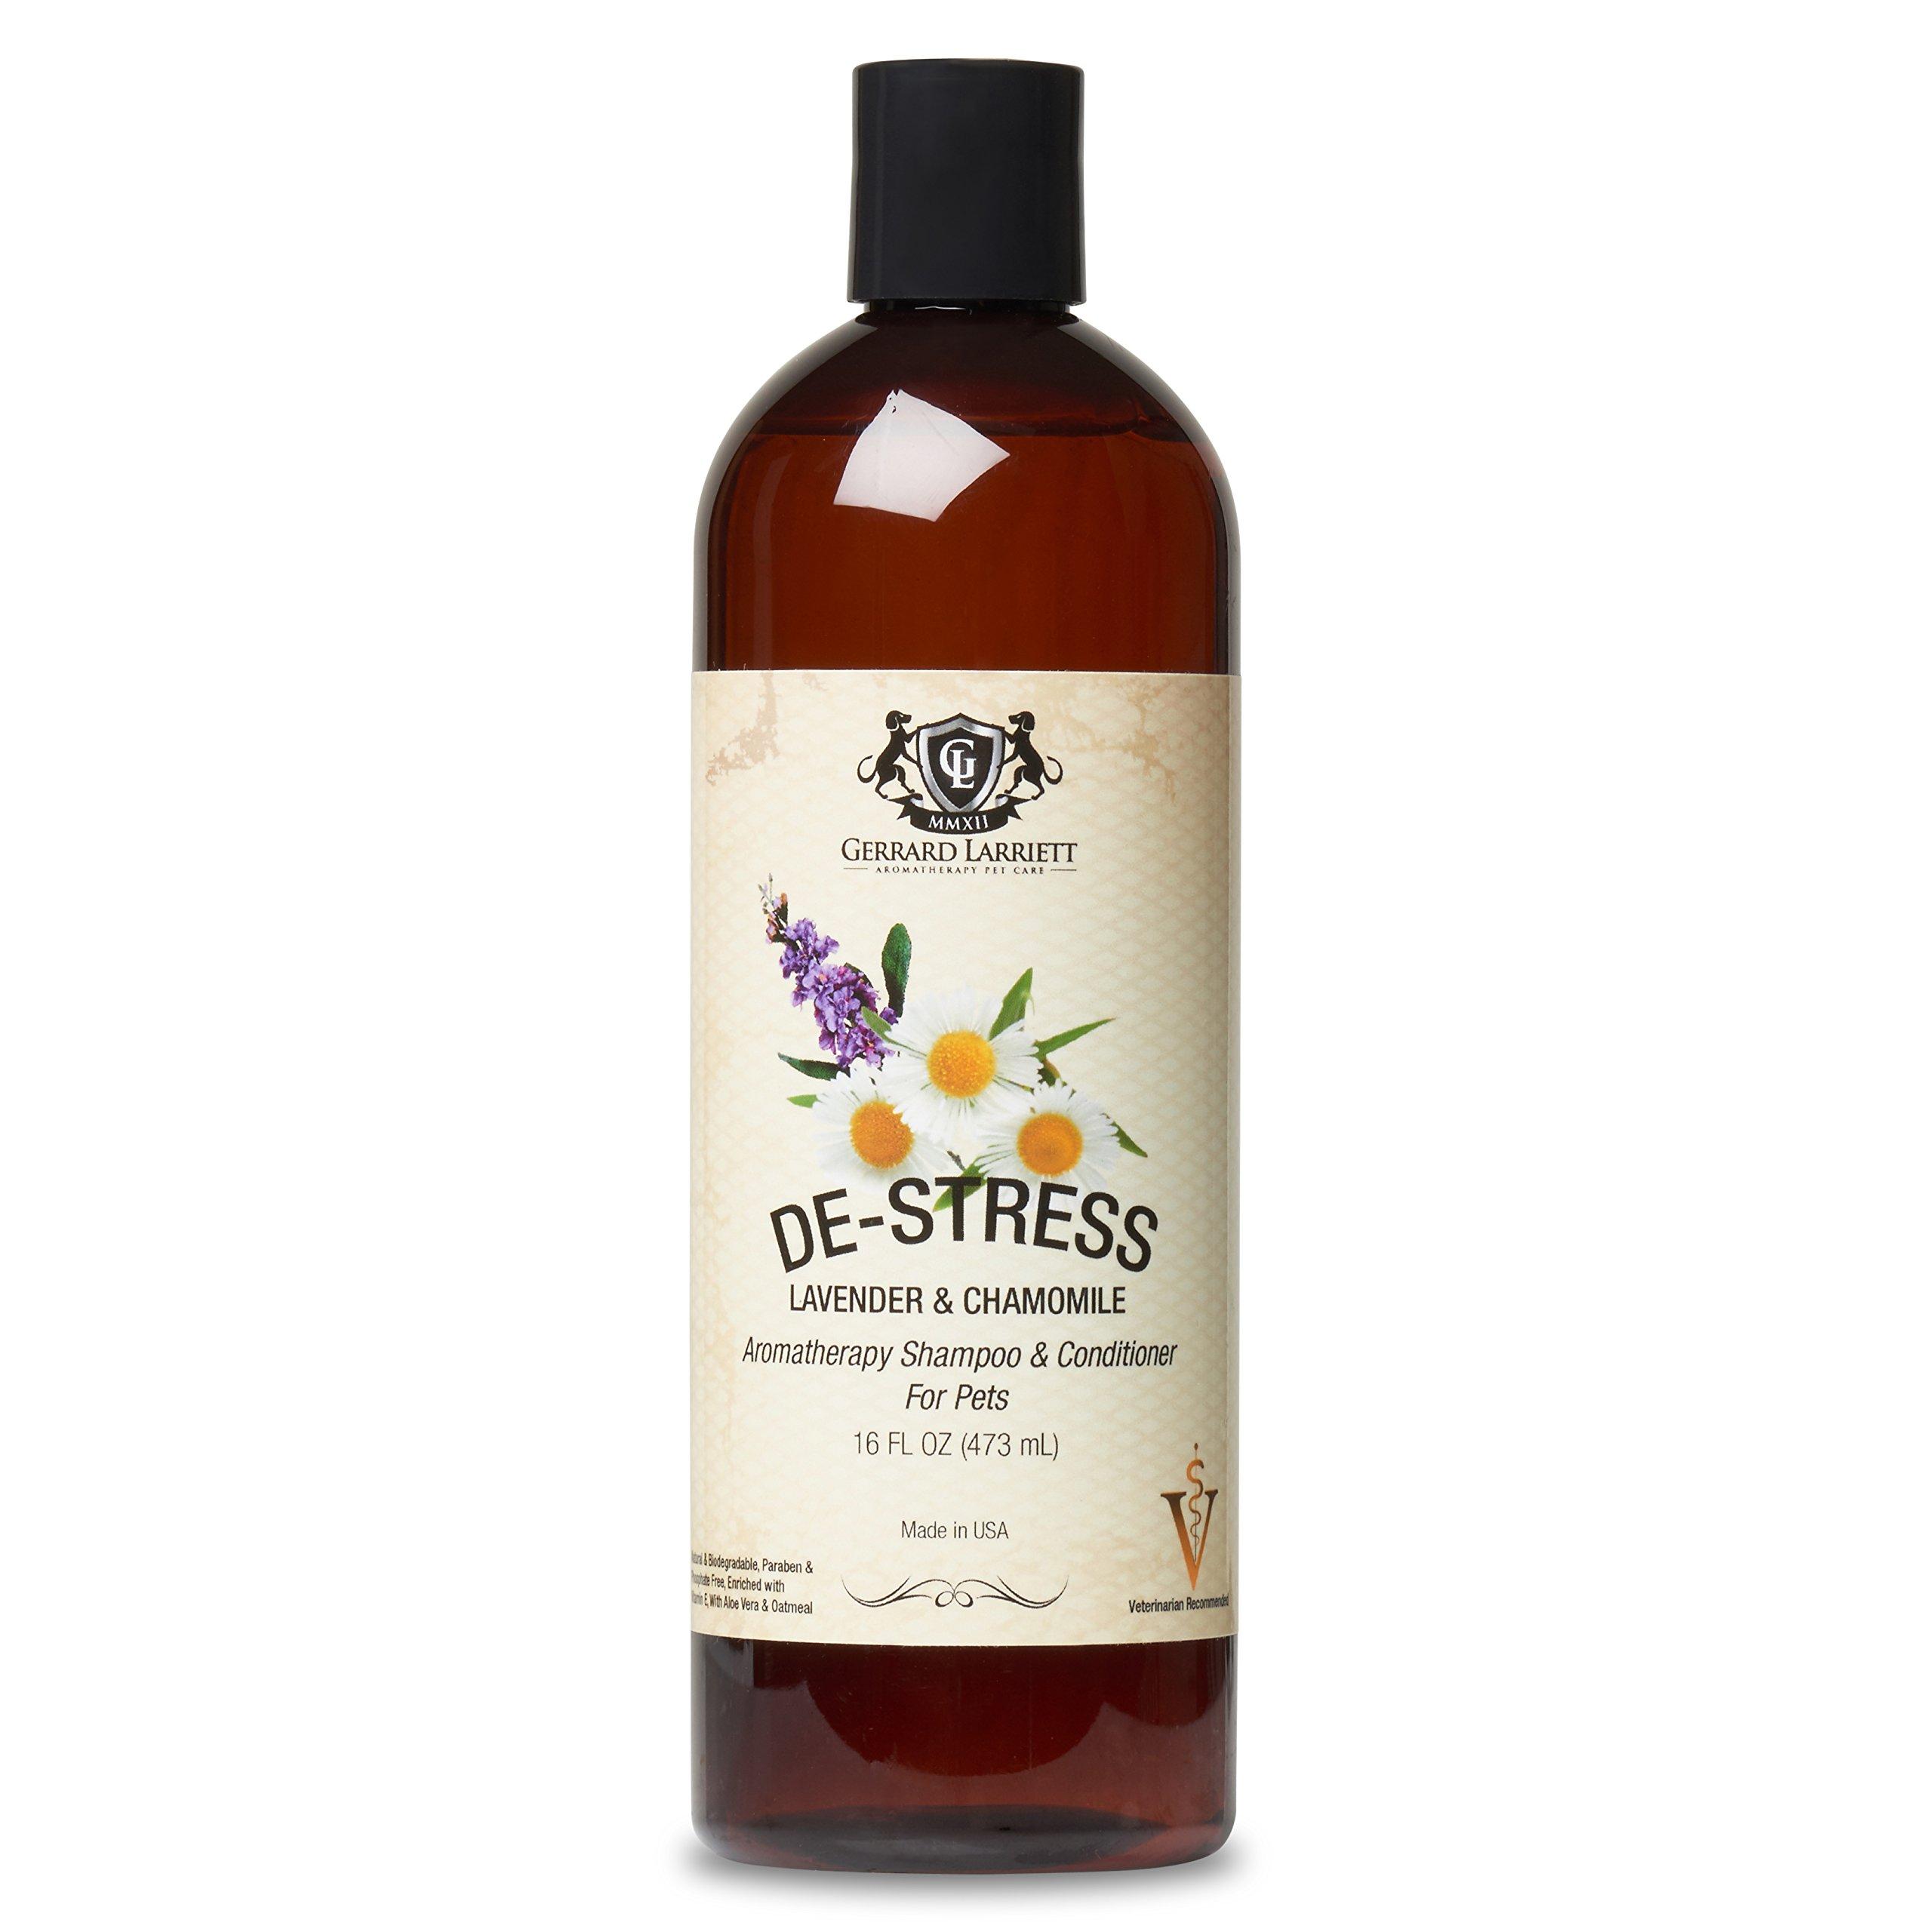 Lavender & Chamomile Aromatherapy Shampoo & Conditioner For Pets, Medicated, Whitening, Oatmeal Dog Shampoo & Pet Odor Eliminator, 16 oz